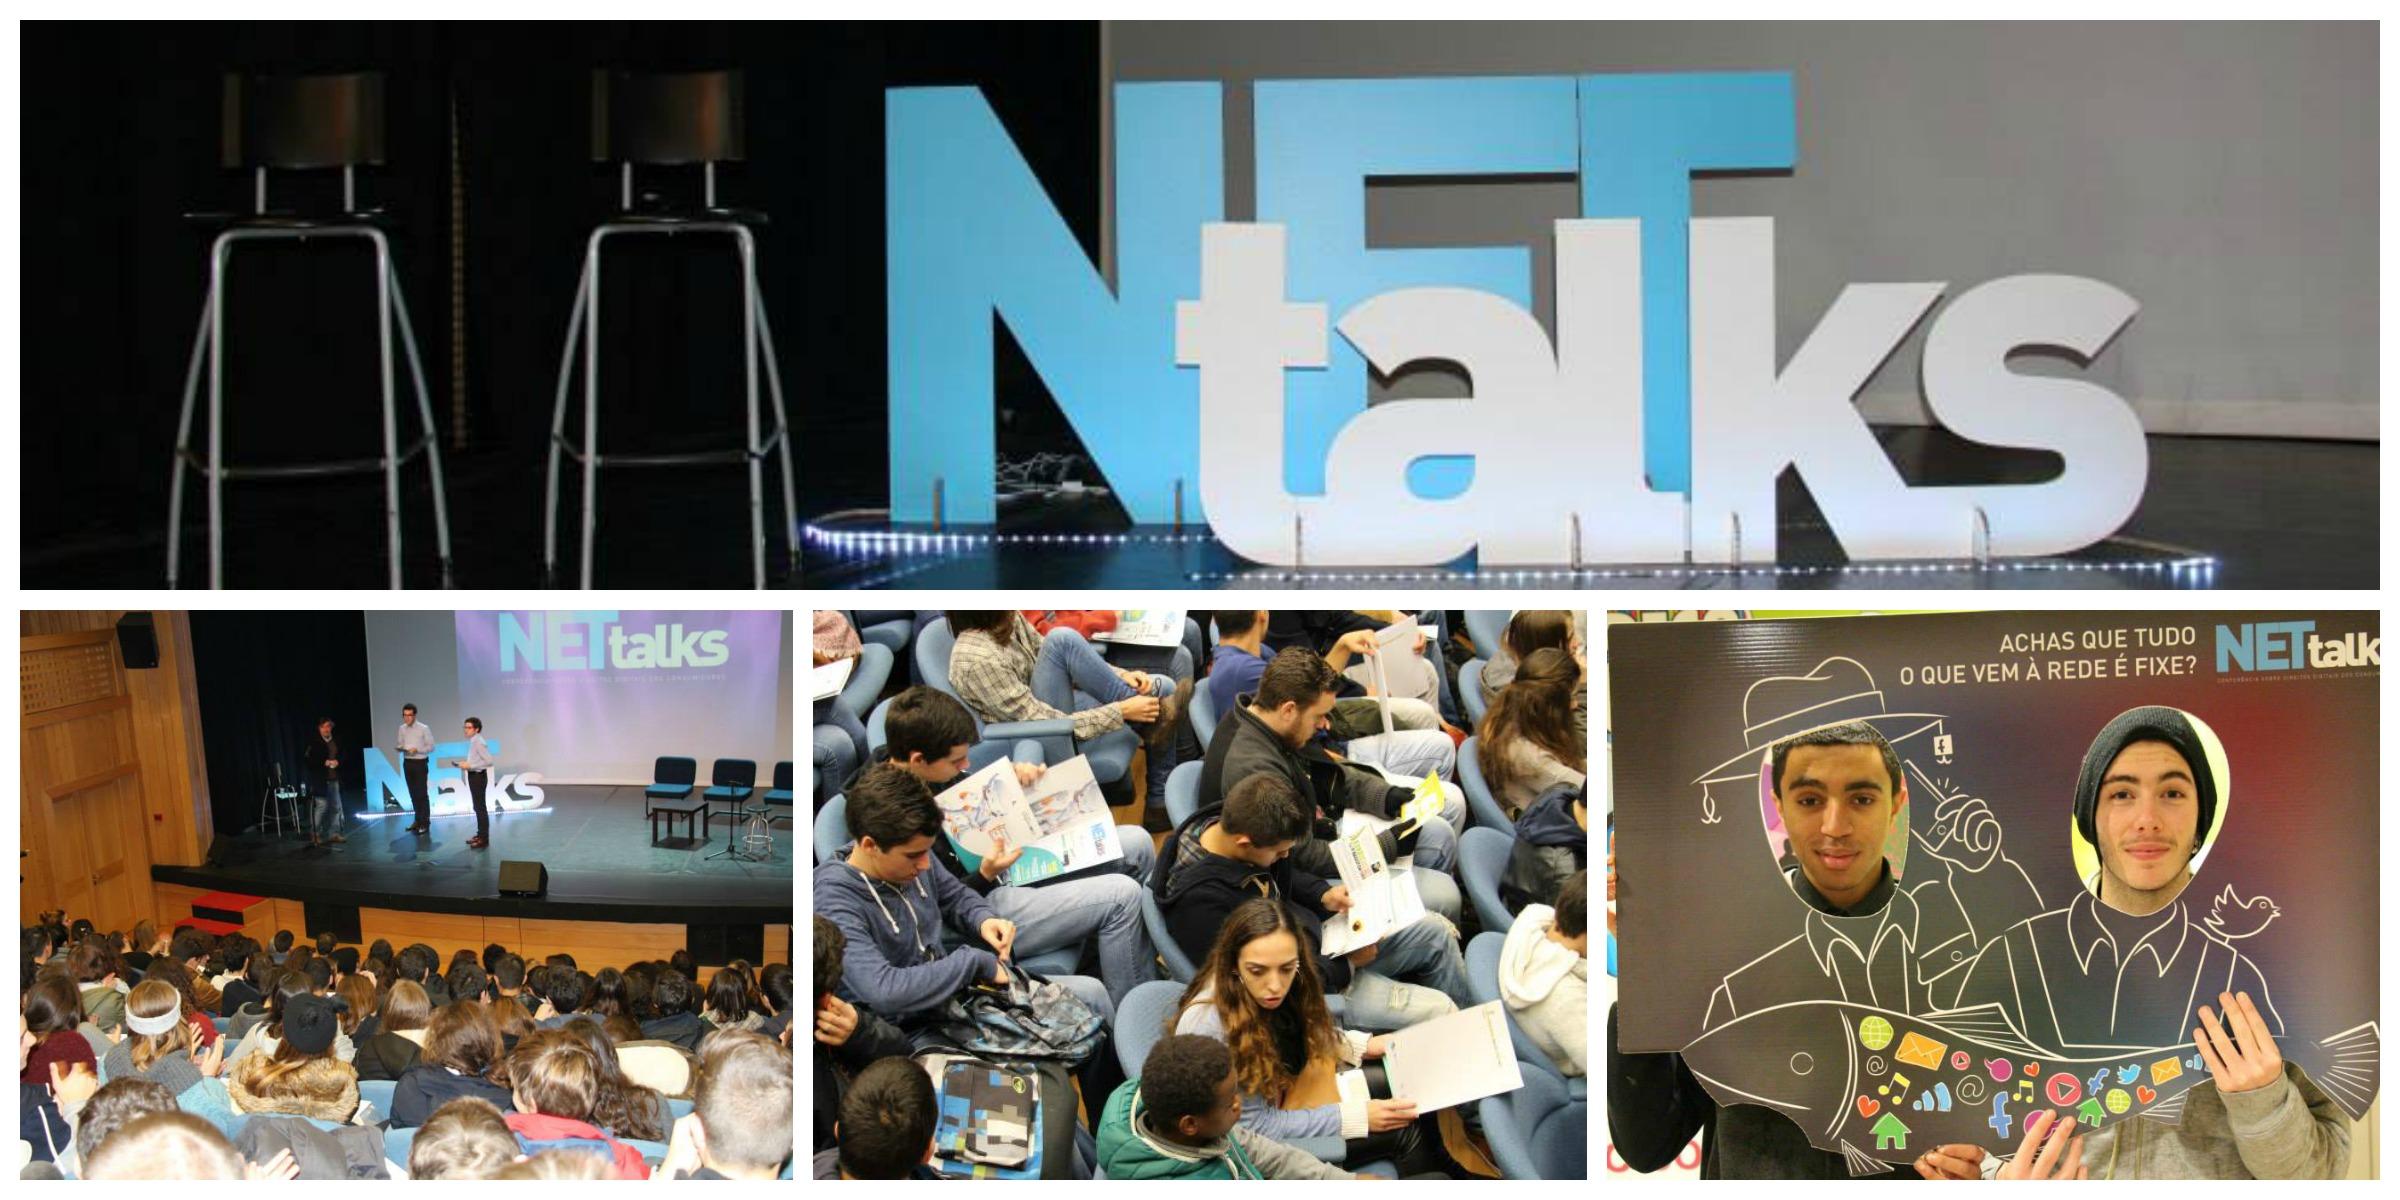 Conferência Nettalks_Colagem